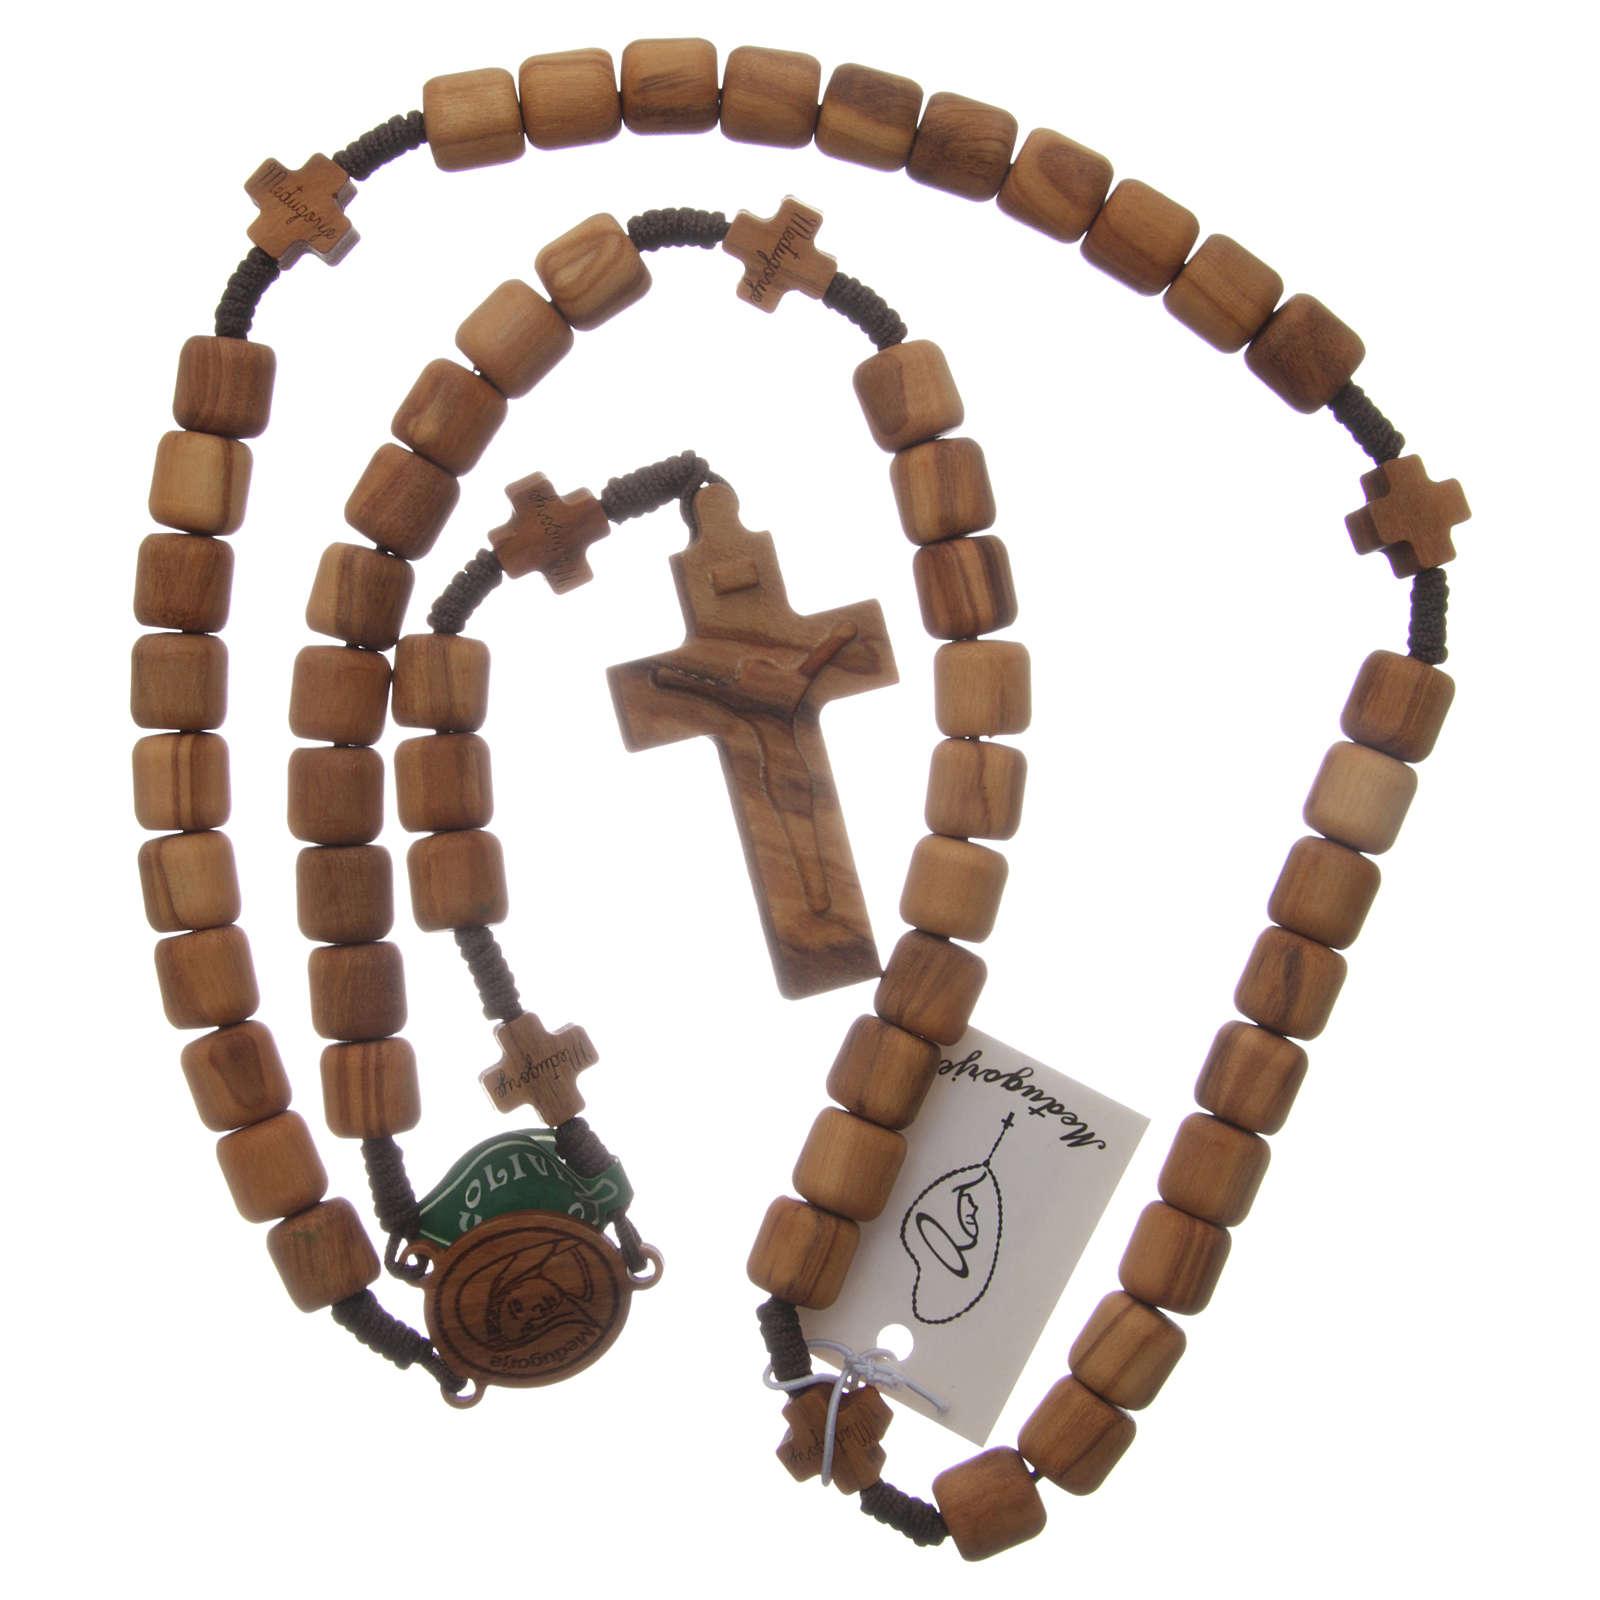 Chapelet Medjugorje croix grains 6 mm olivier corde marron 4